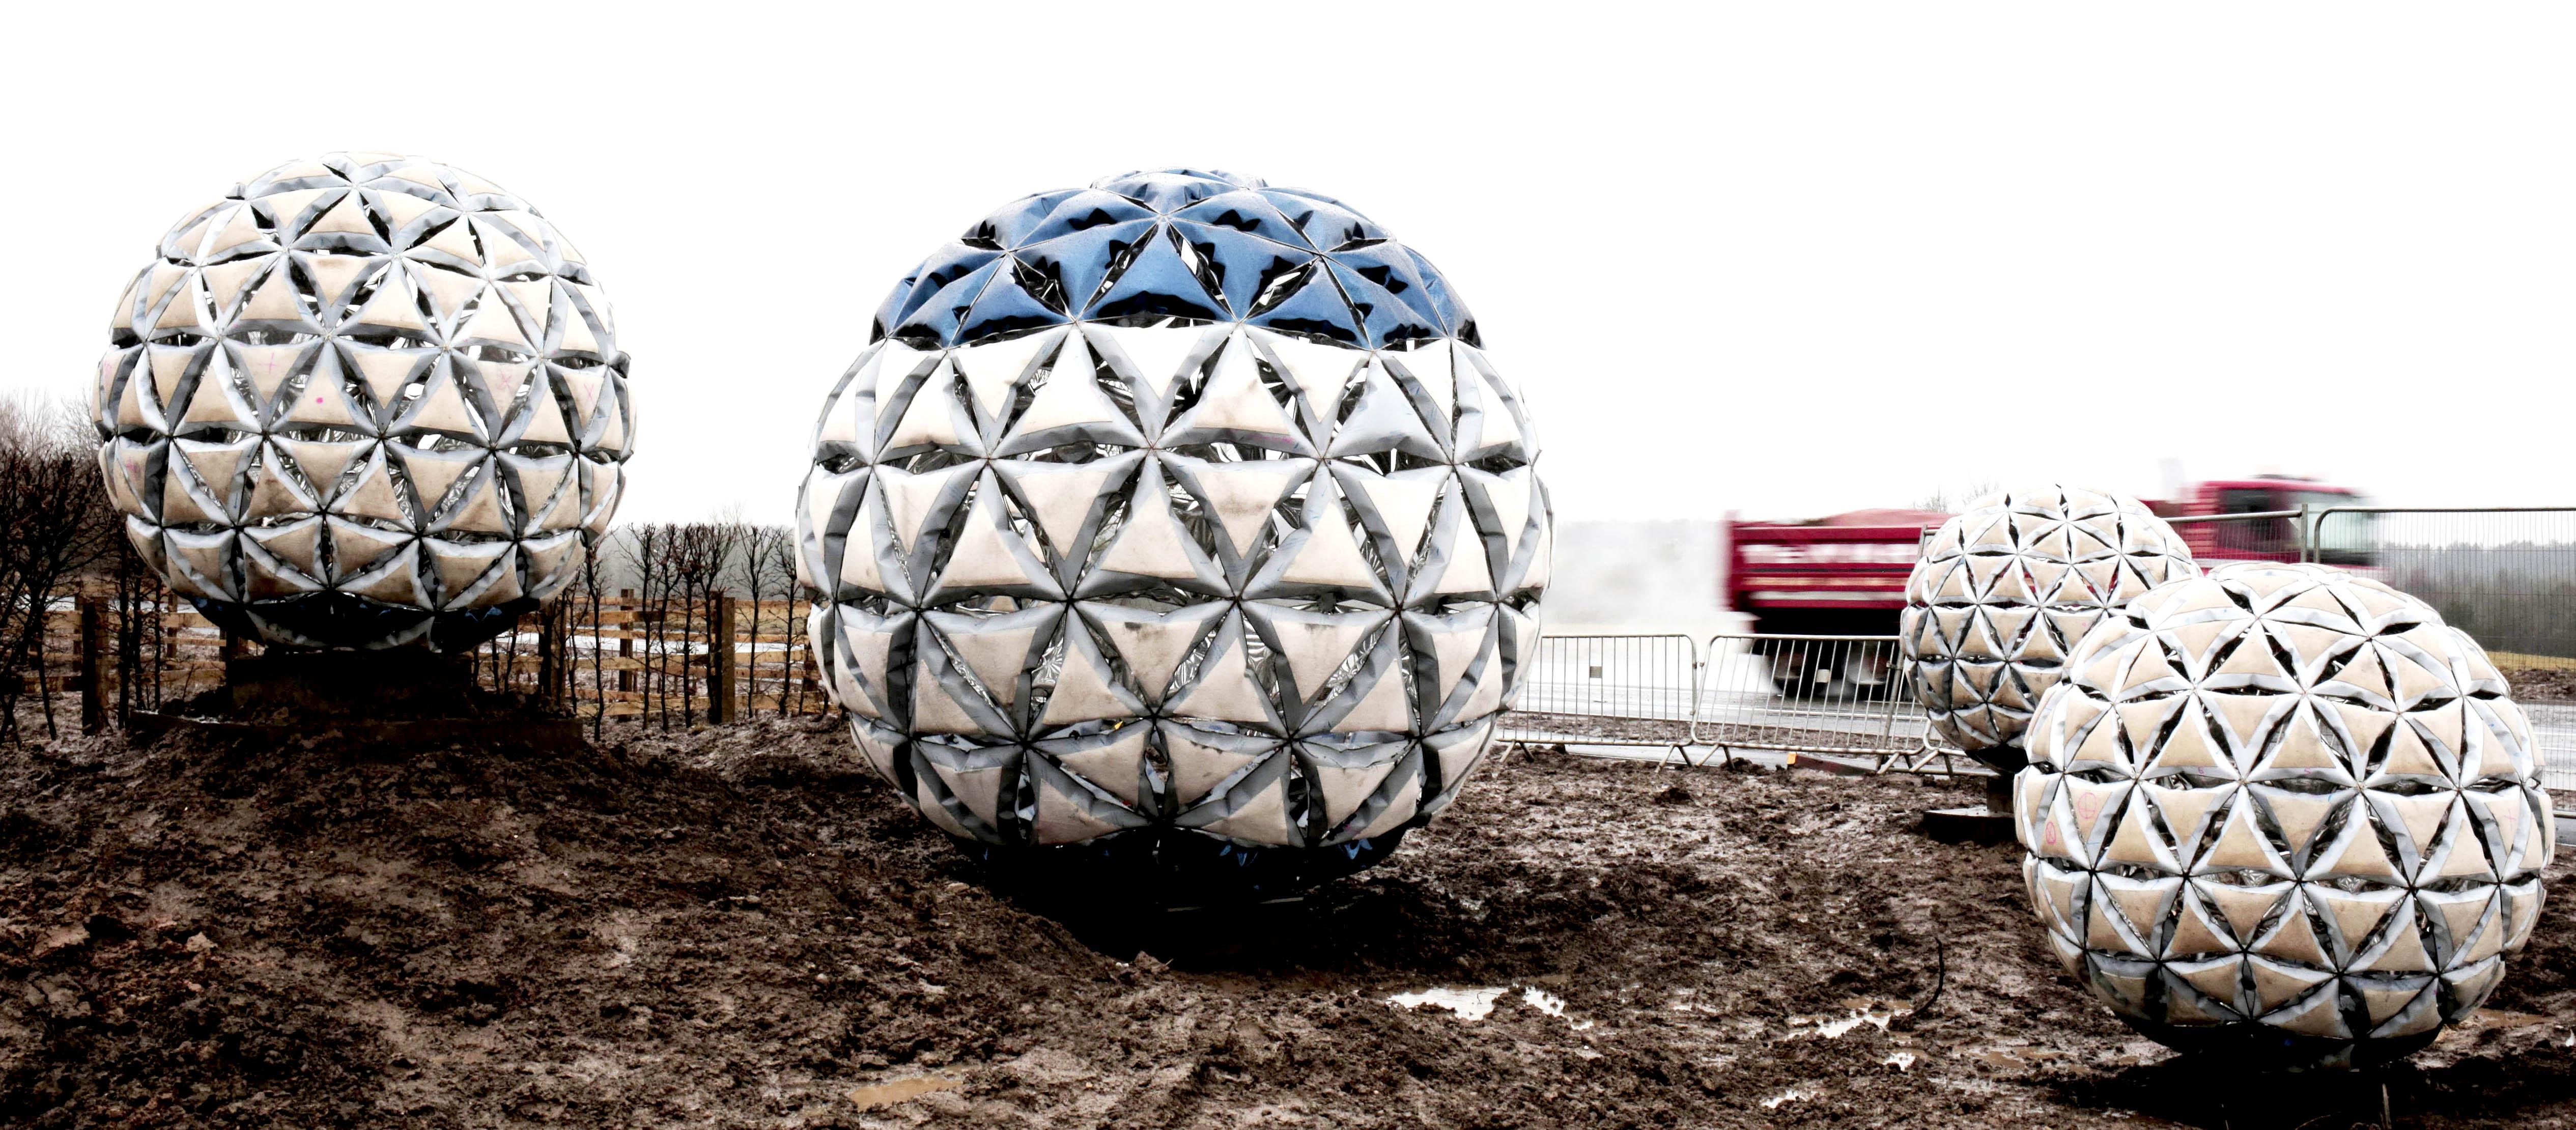 NetPark's New Sculpture